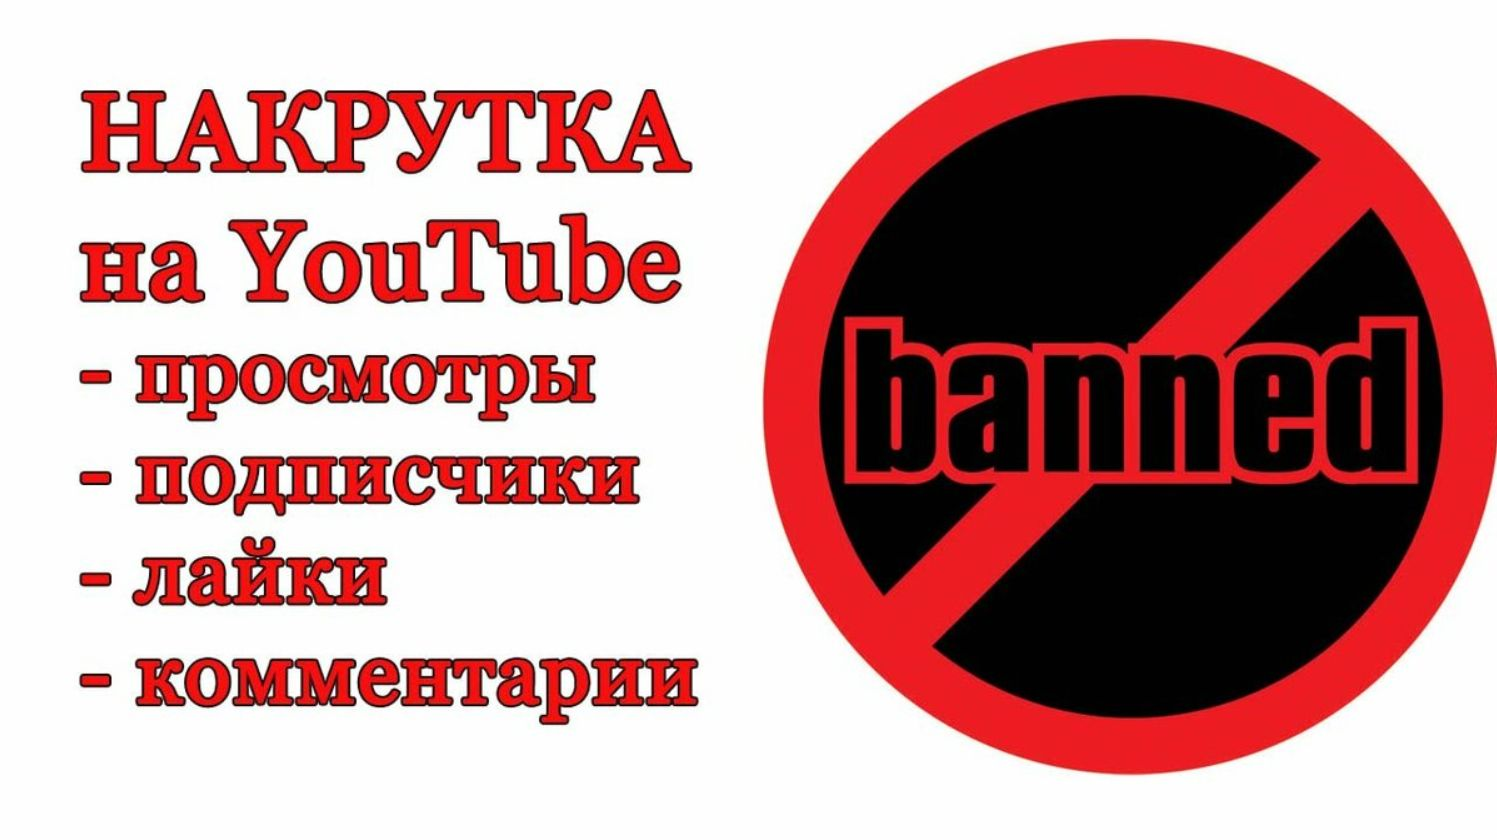 youtube nakrutka - Кому отключат монетизацию на YouTube-канале в 2019 году?